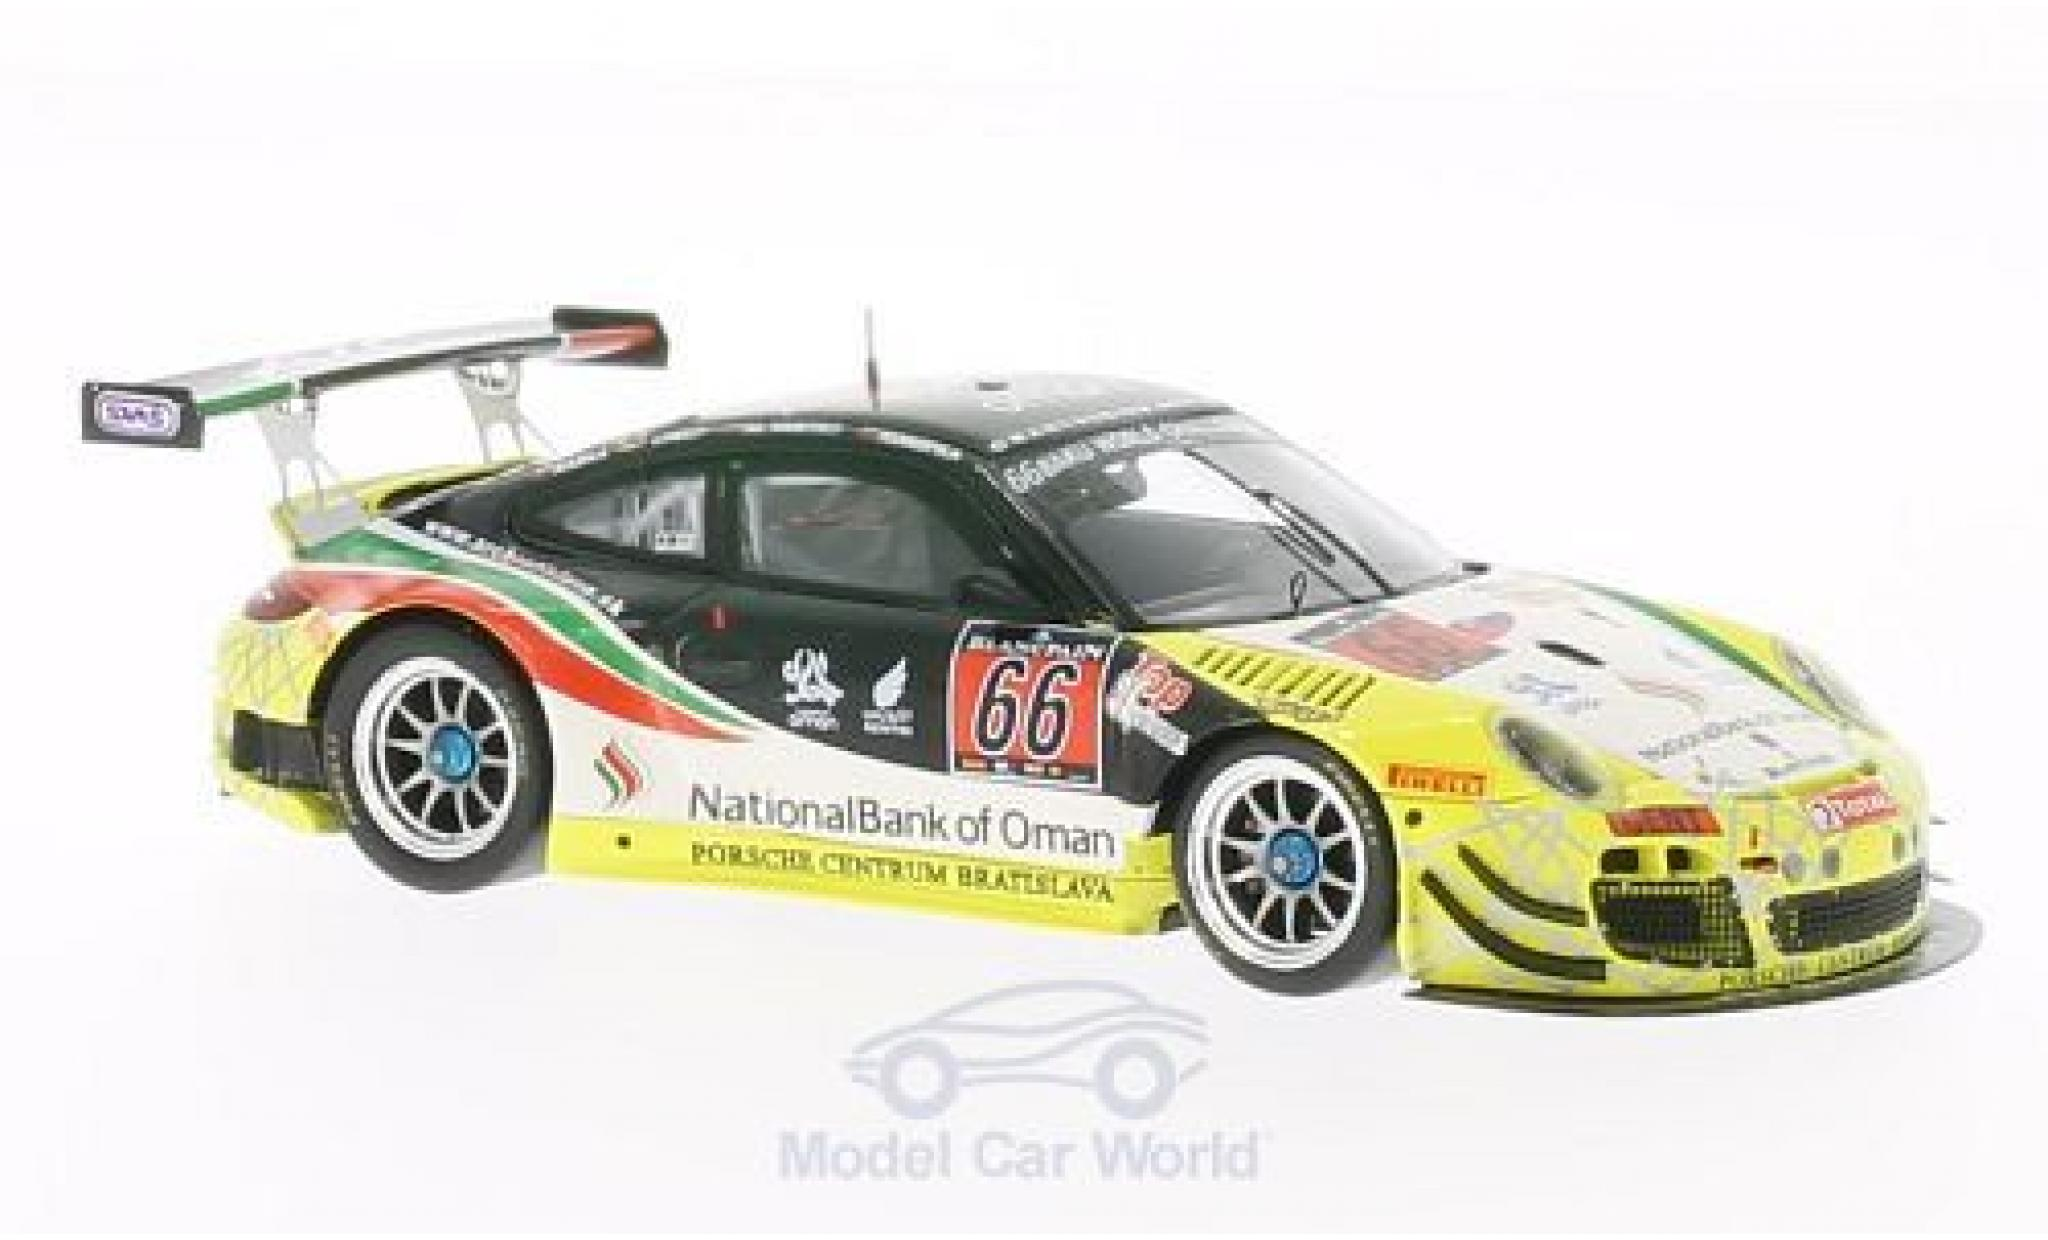 Porsche 991 GT3 R 1/43 Spark 911 (997) No.66 National Bank of Oman 24h Spa 2013 A.Al Harty/M.Konopka/J.Raska/M.Schelp